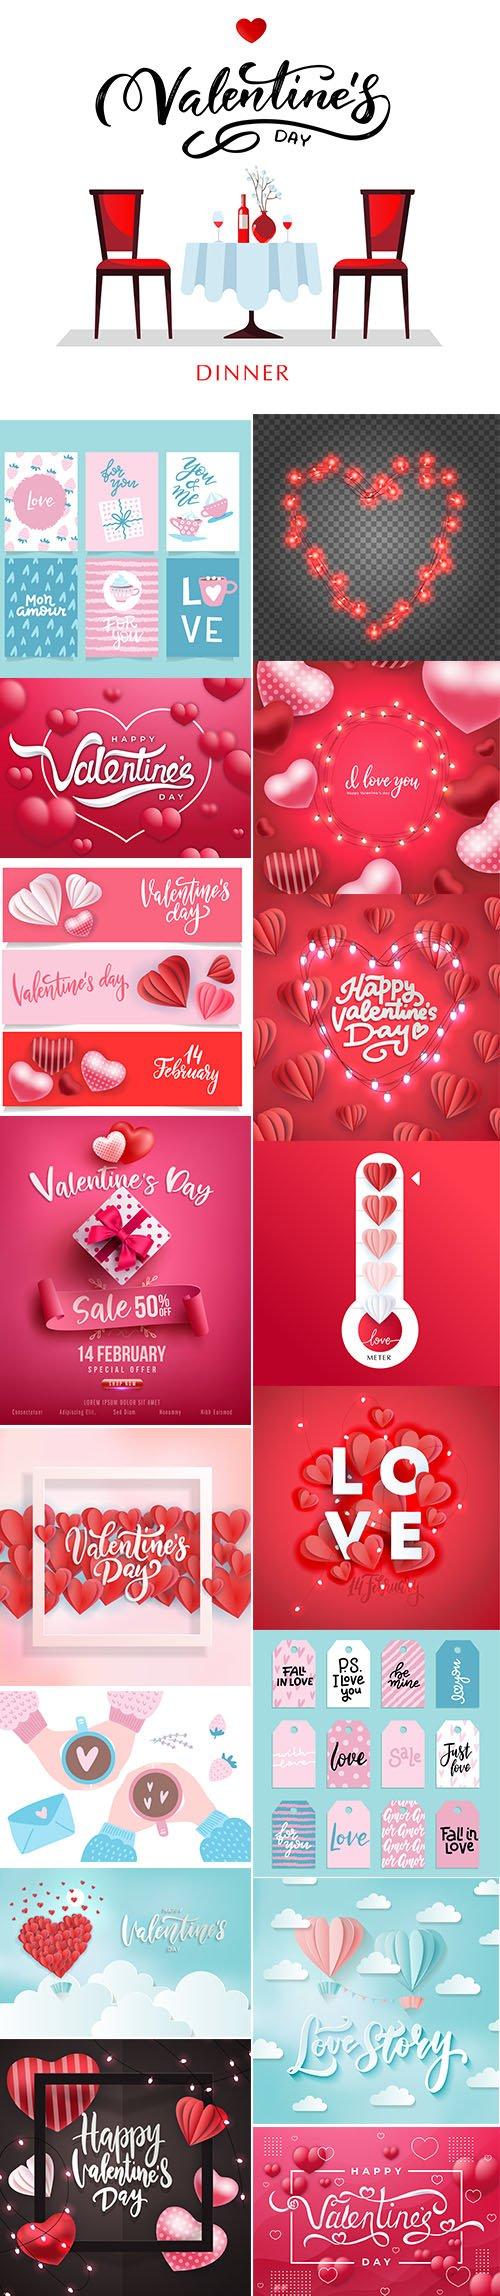 Set of Romantic Valentines Day Illustrations Vol 7